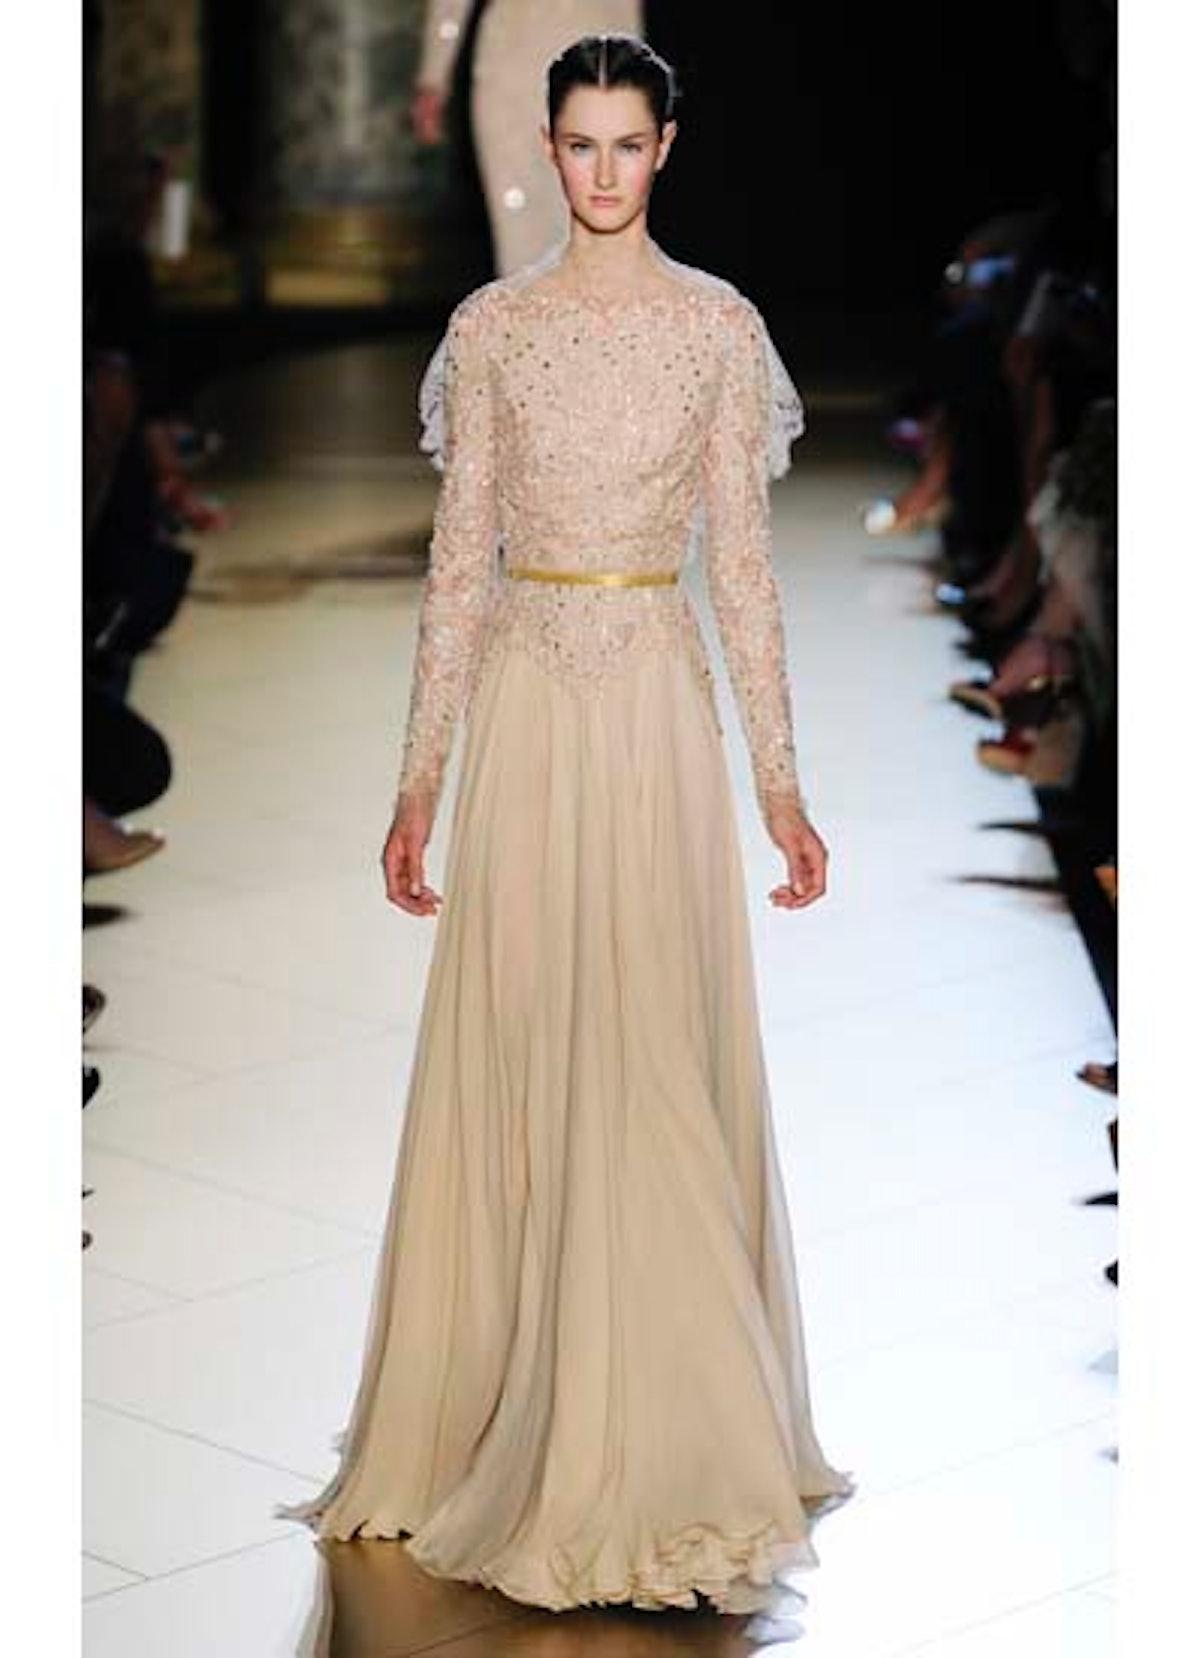 fass-elie-saab-couture-2012-runway-11-v.jpg